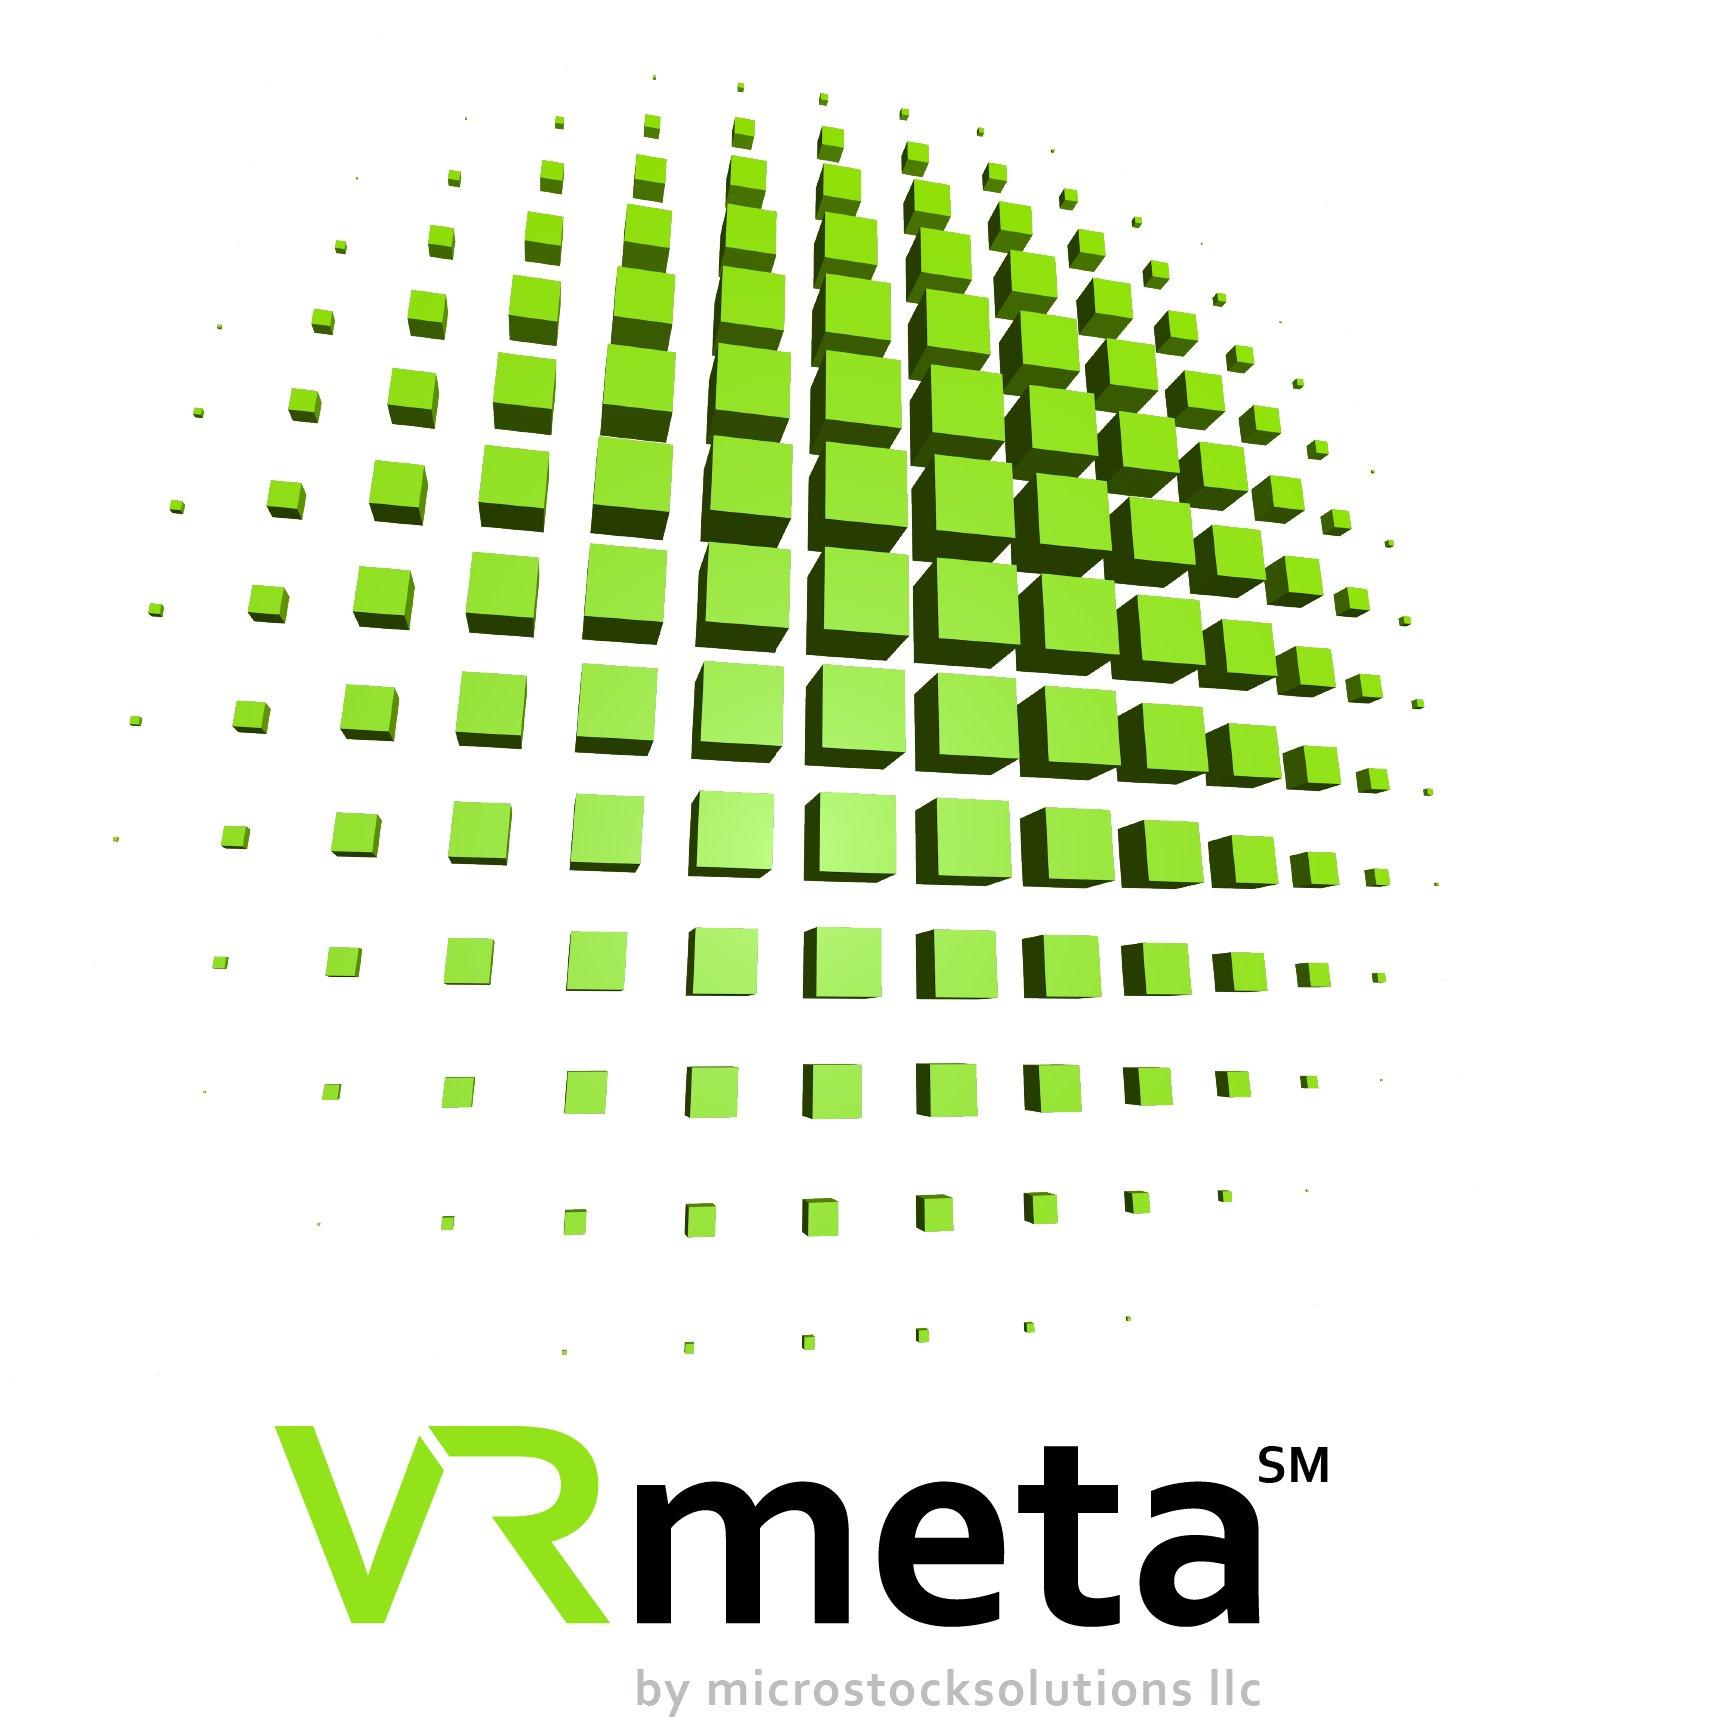 VRMeta logo